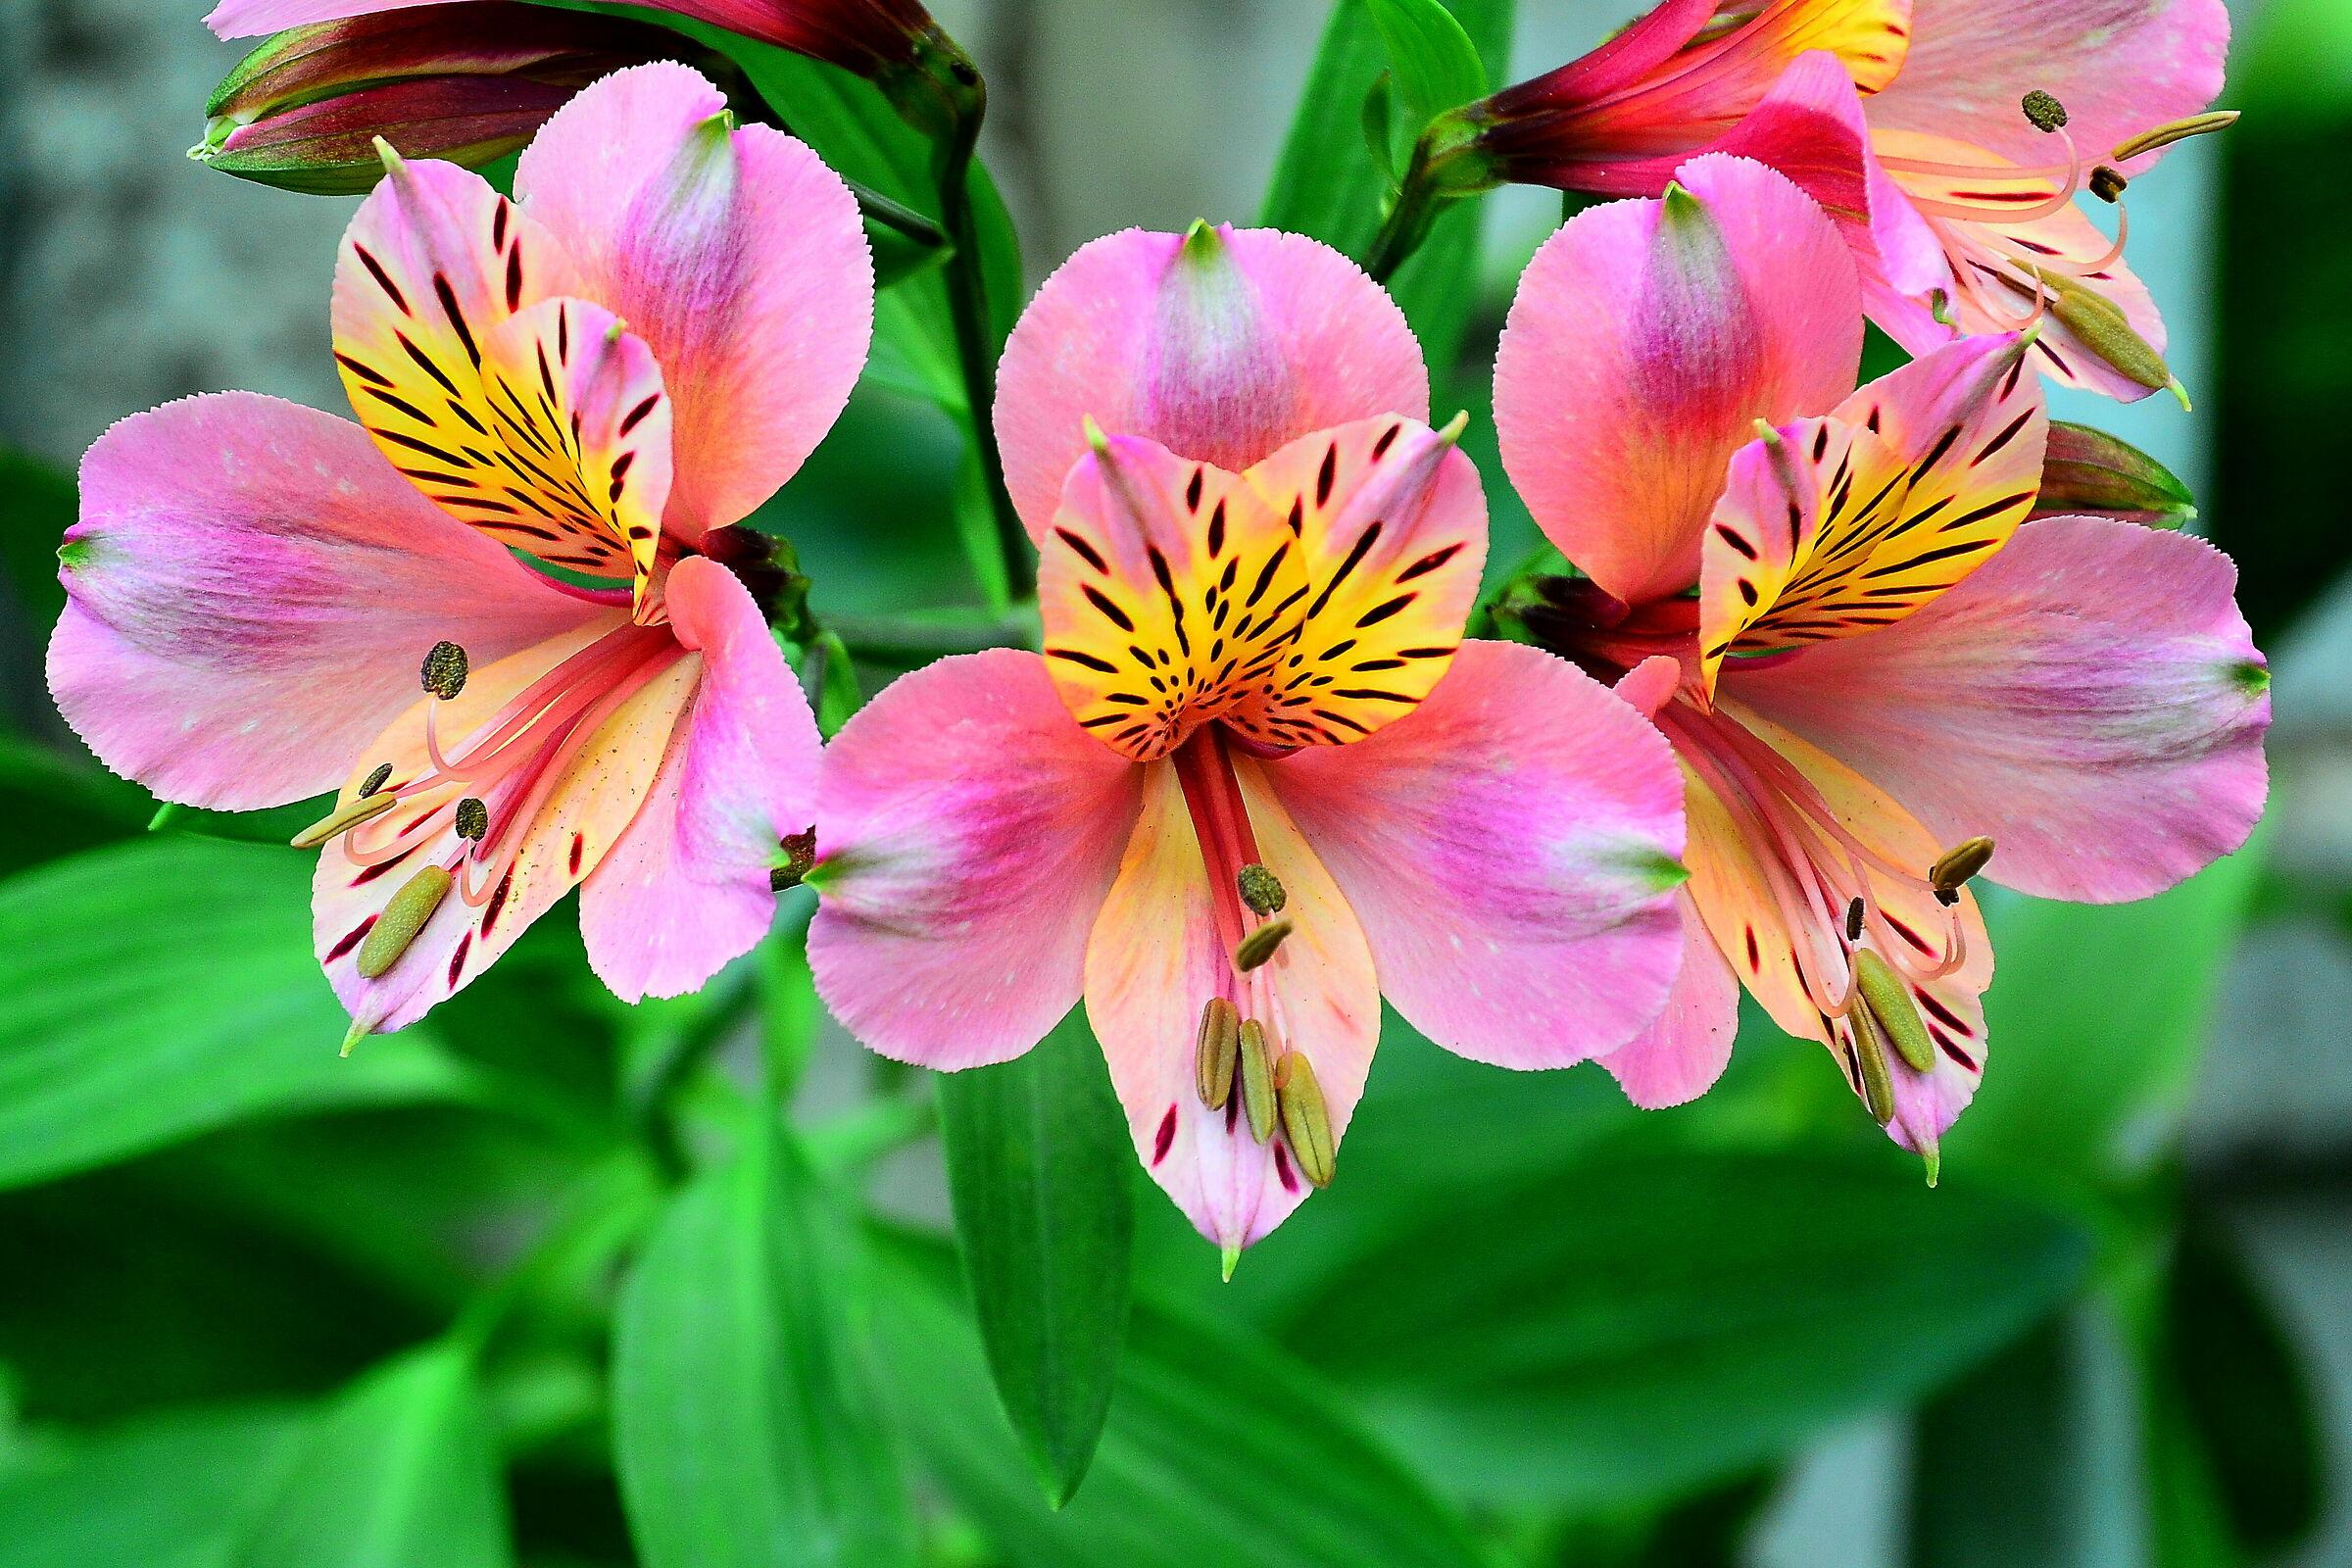 Alstroemeria or the flower of friendship...